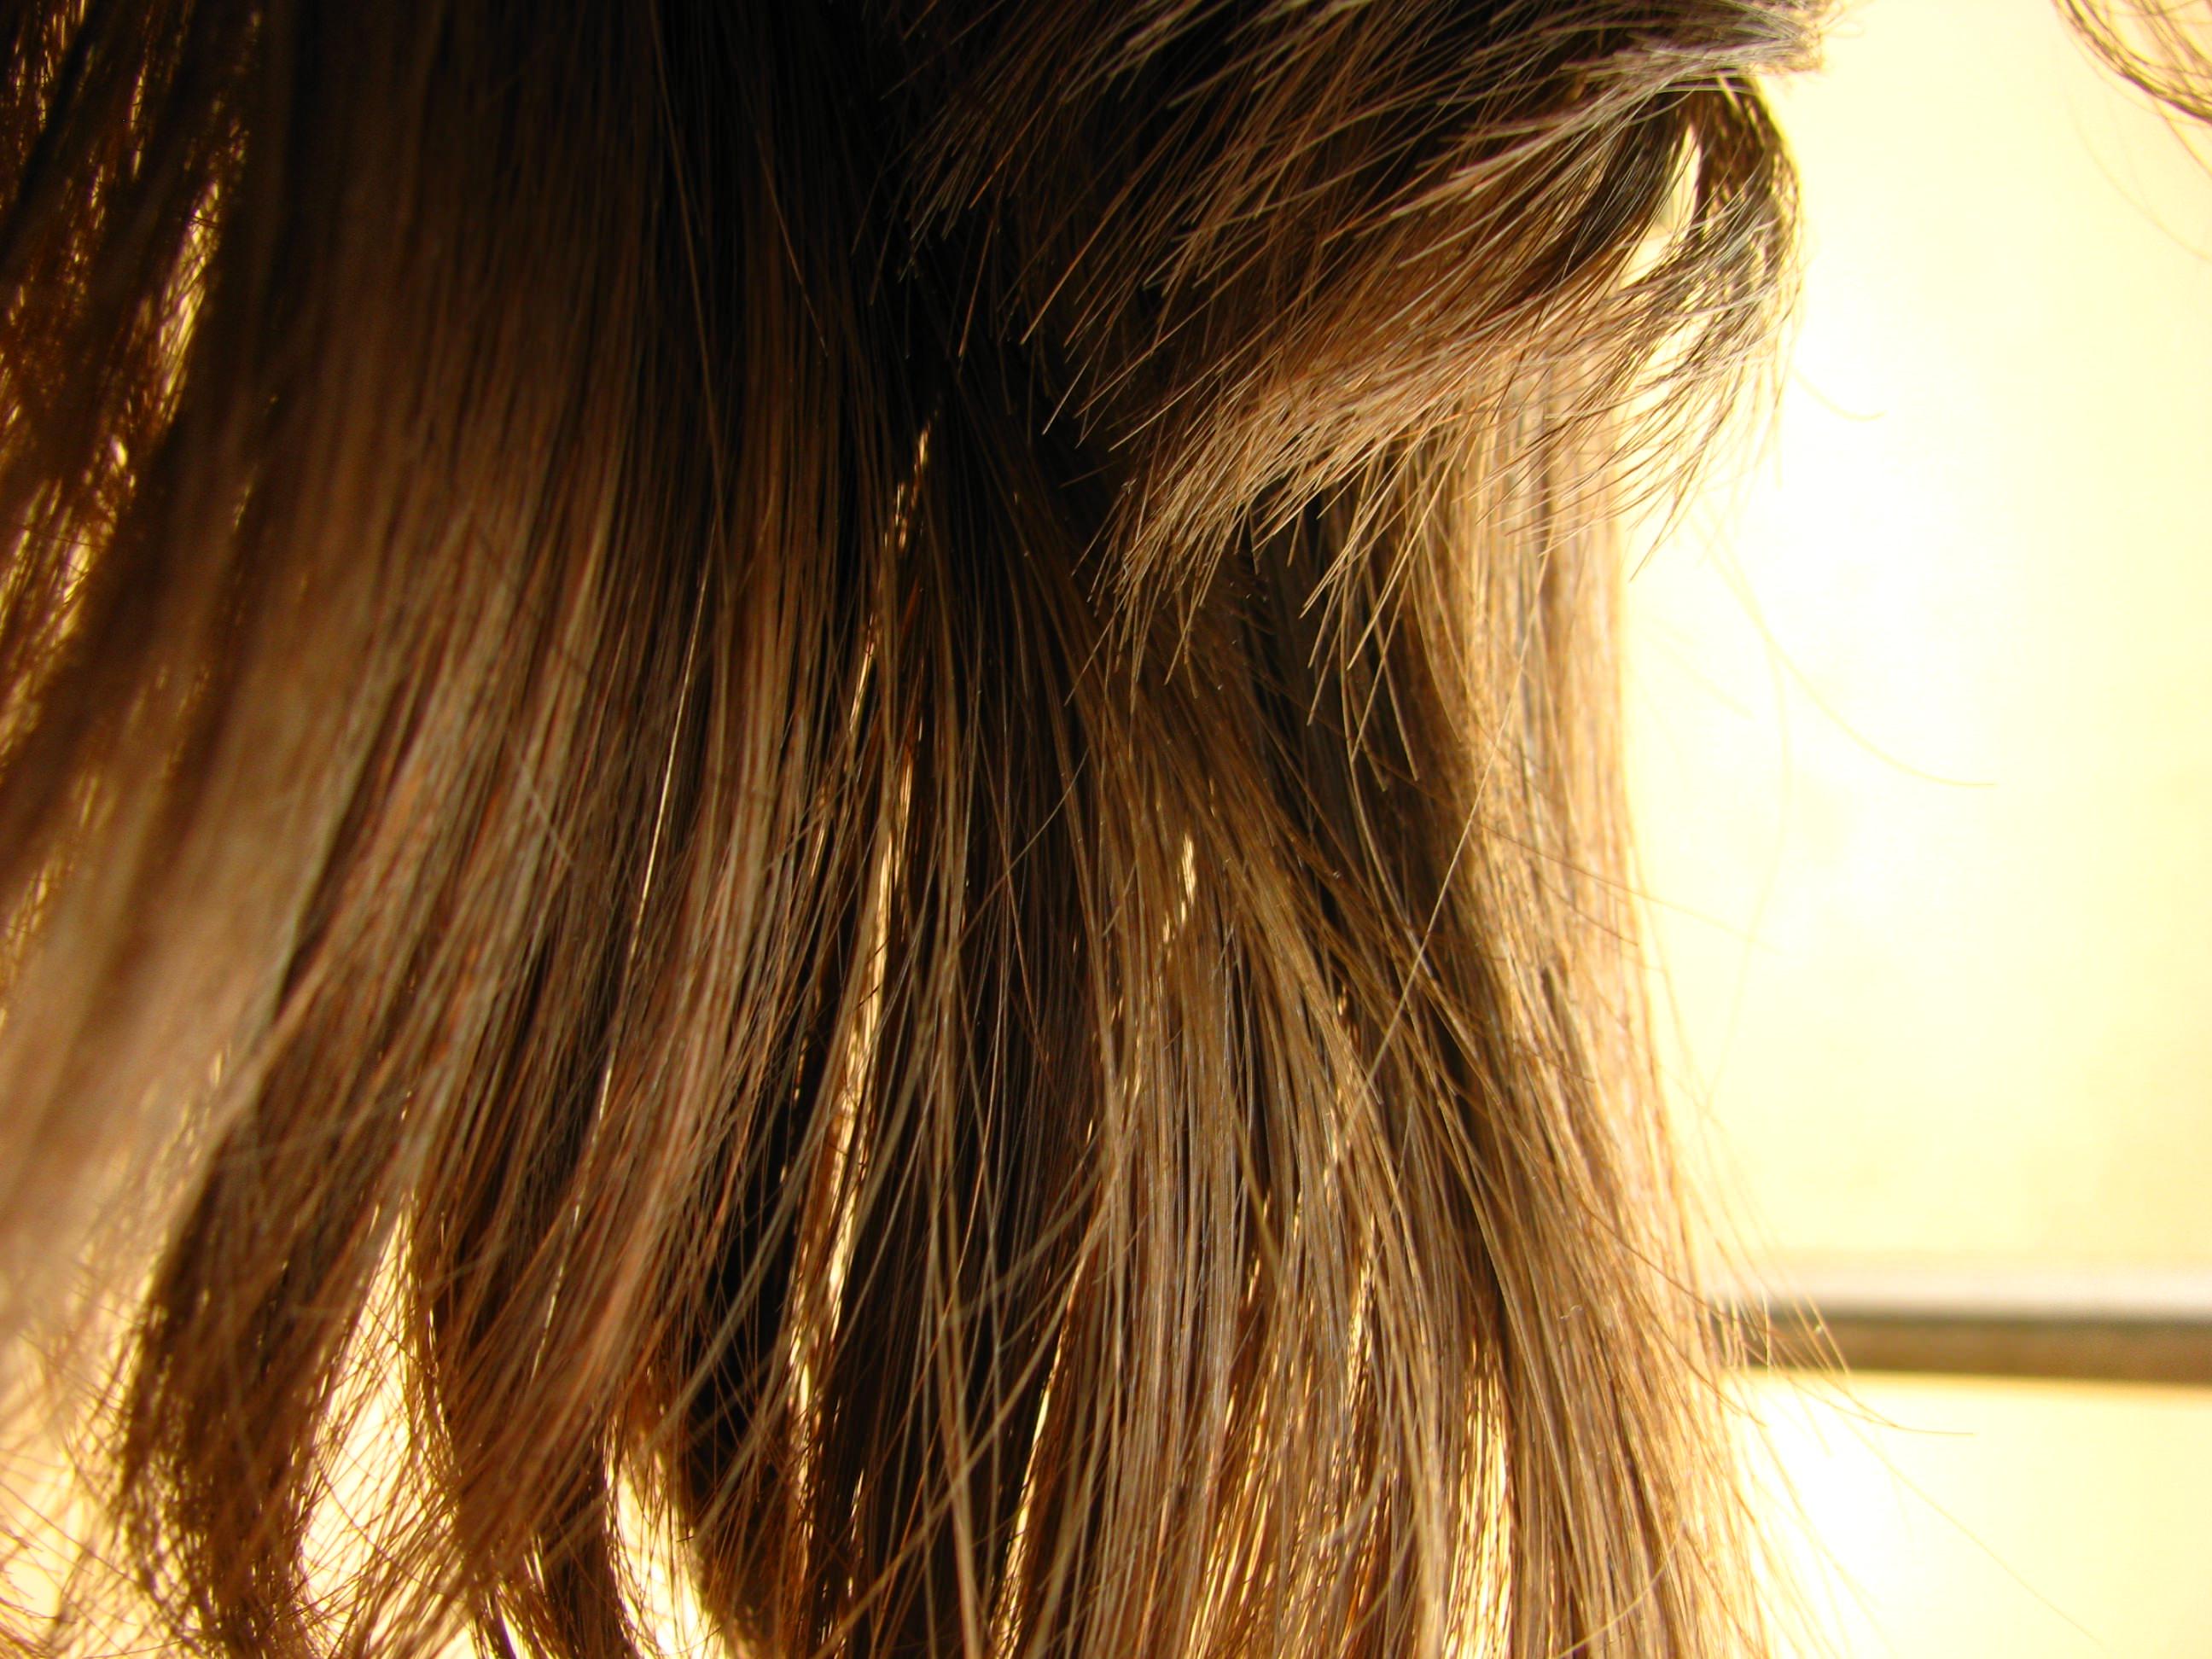 AC-SH-AC (acondicionador-shampoo-acondicionador)